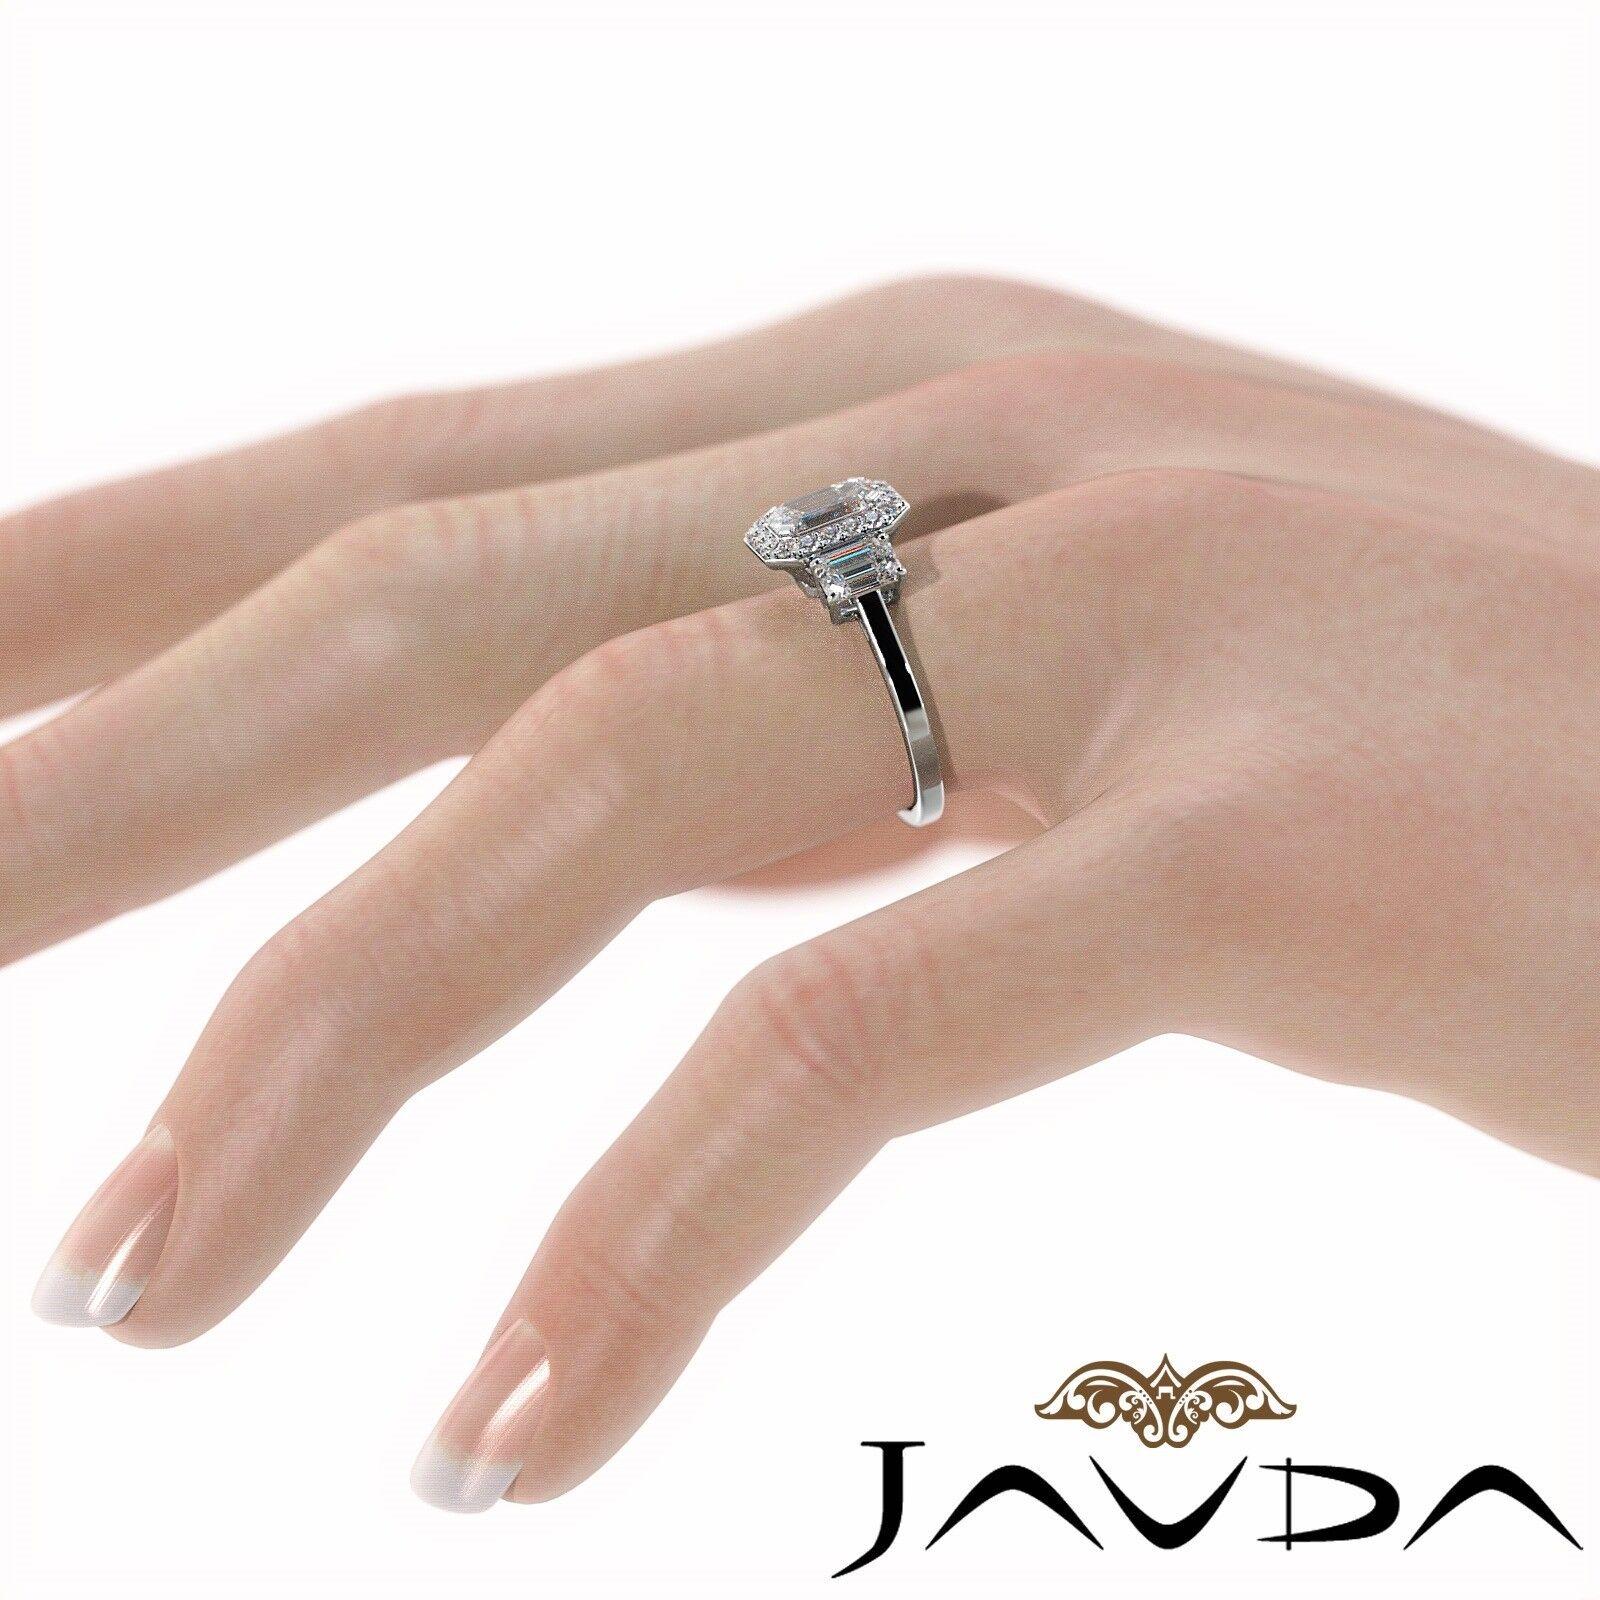 1.55ctw 3 Stone Halo Pave Emerald Diamond Engagement Ring GIA F-SI2 White Gold 4